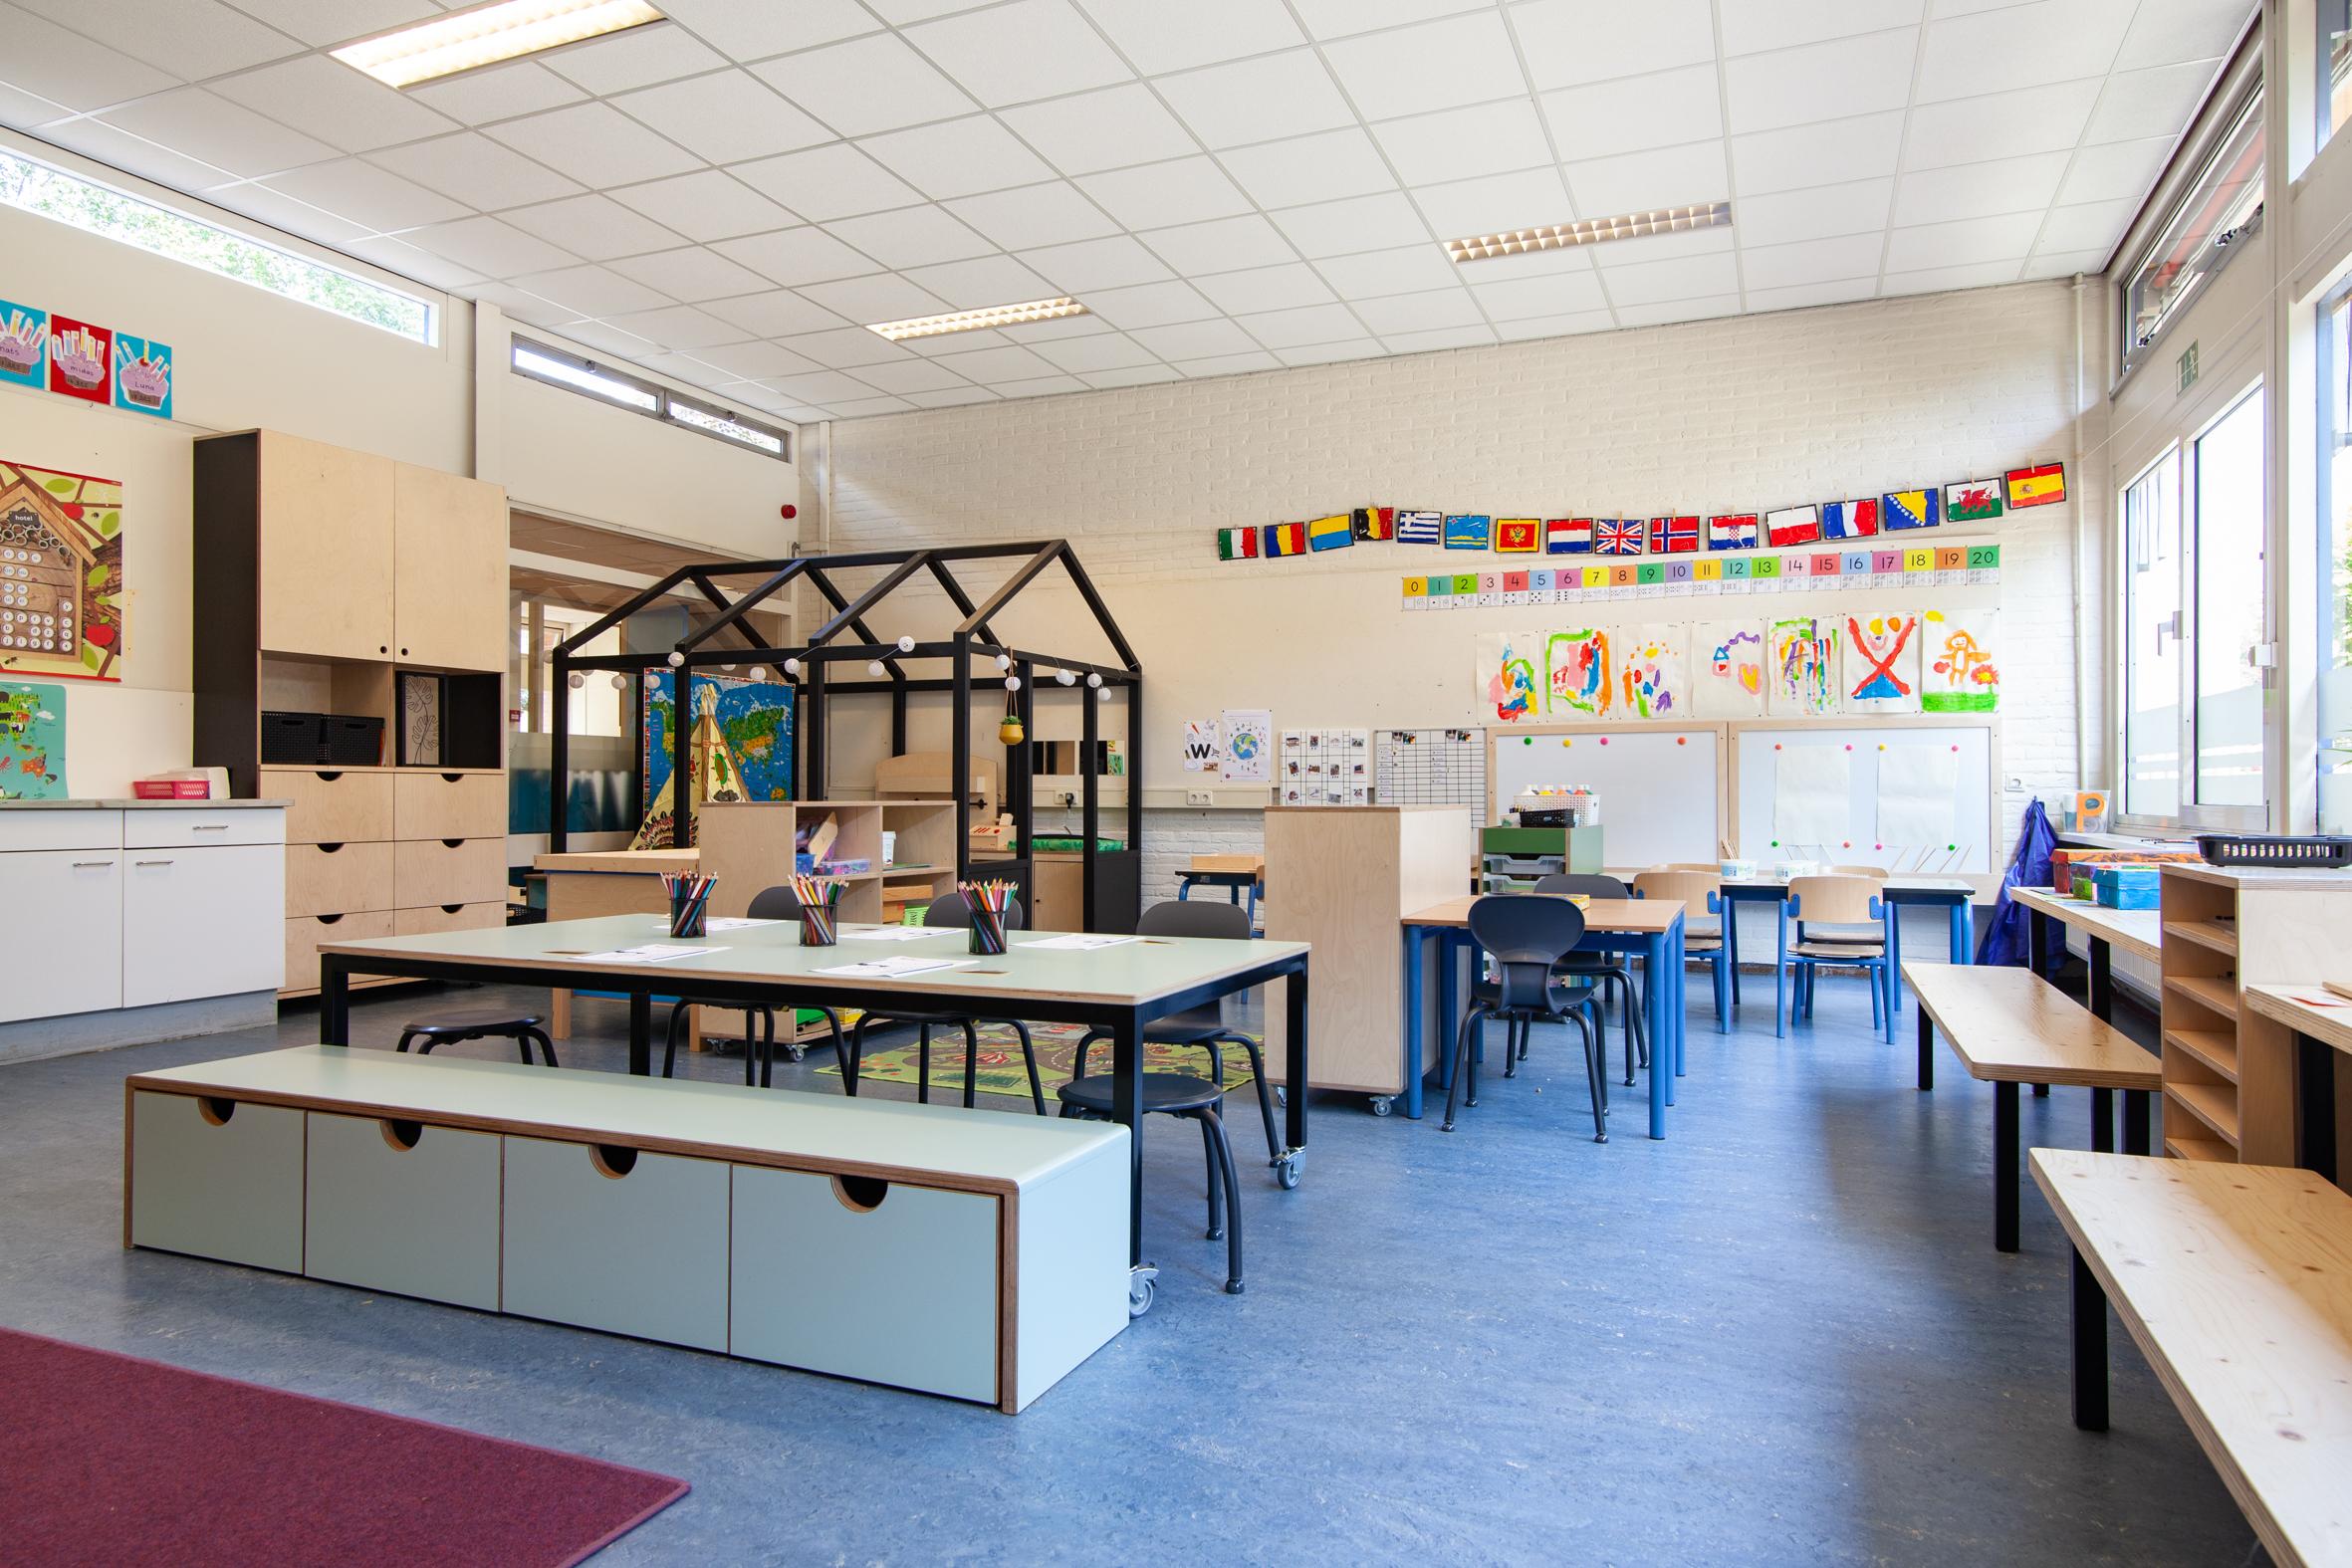 Interieur basisschool De Cirkel